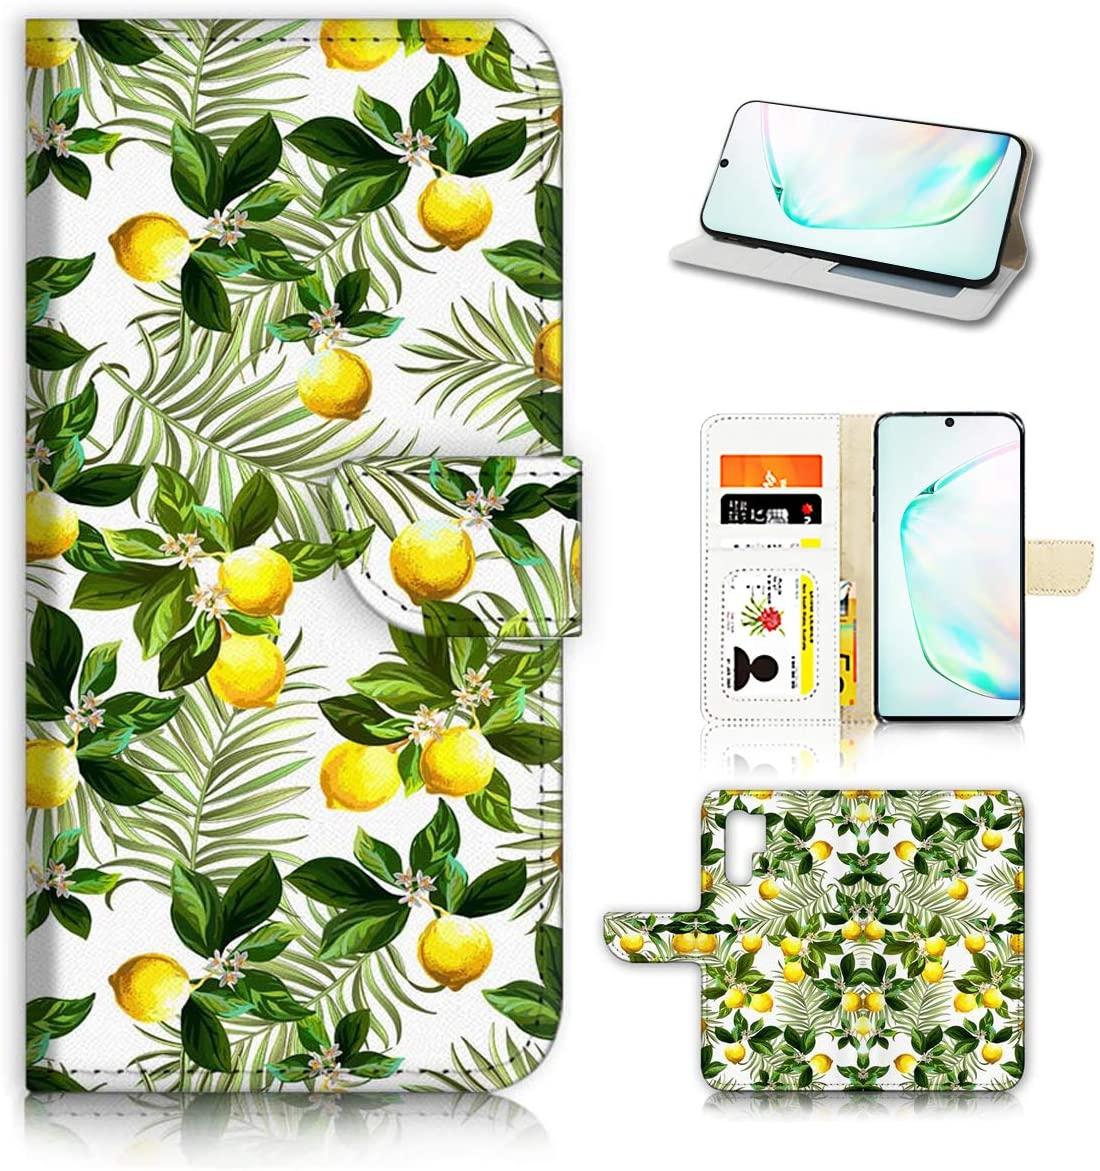 for Samsung Note 10+, Galaxy Note 10 Plus, Designed Flip Wallet Phone Case Cover, A21802 Tropical Palm Lemon Lemonade2180